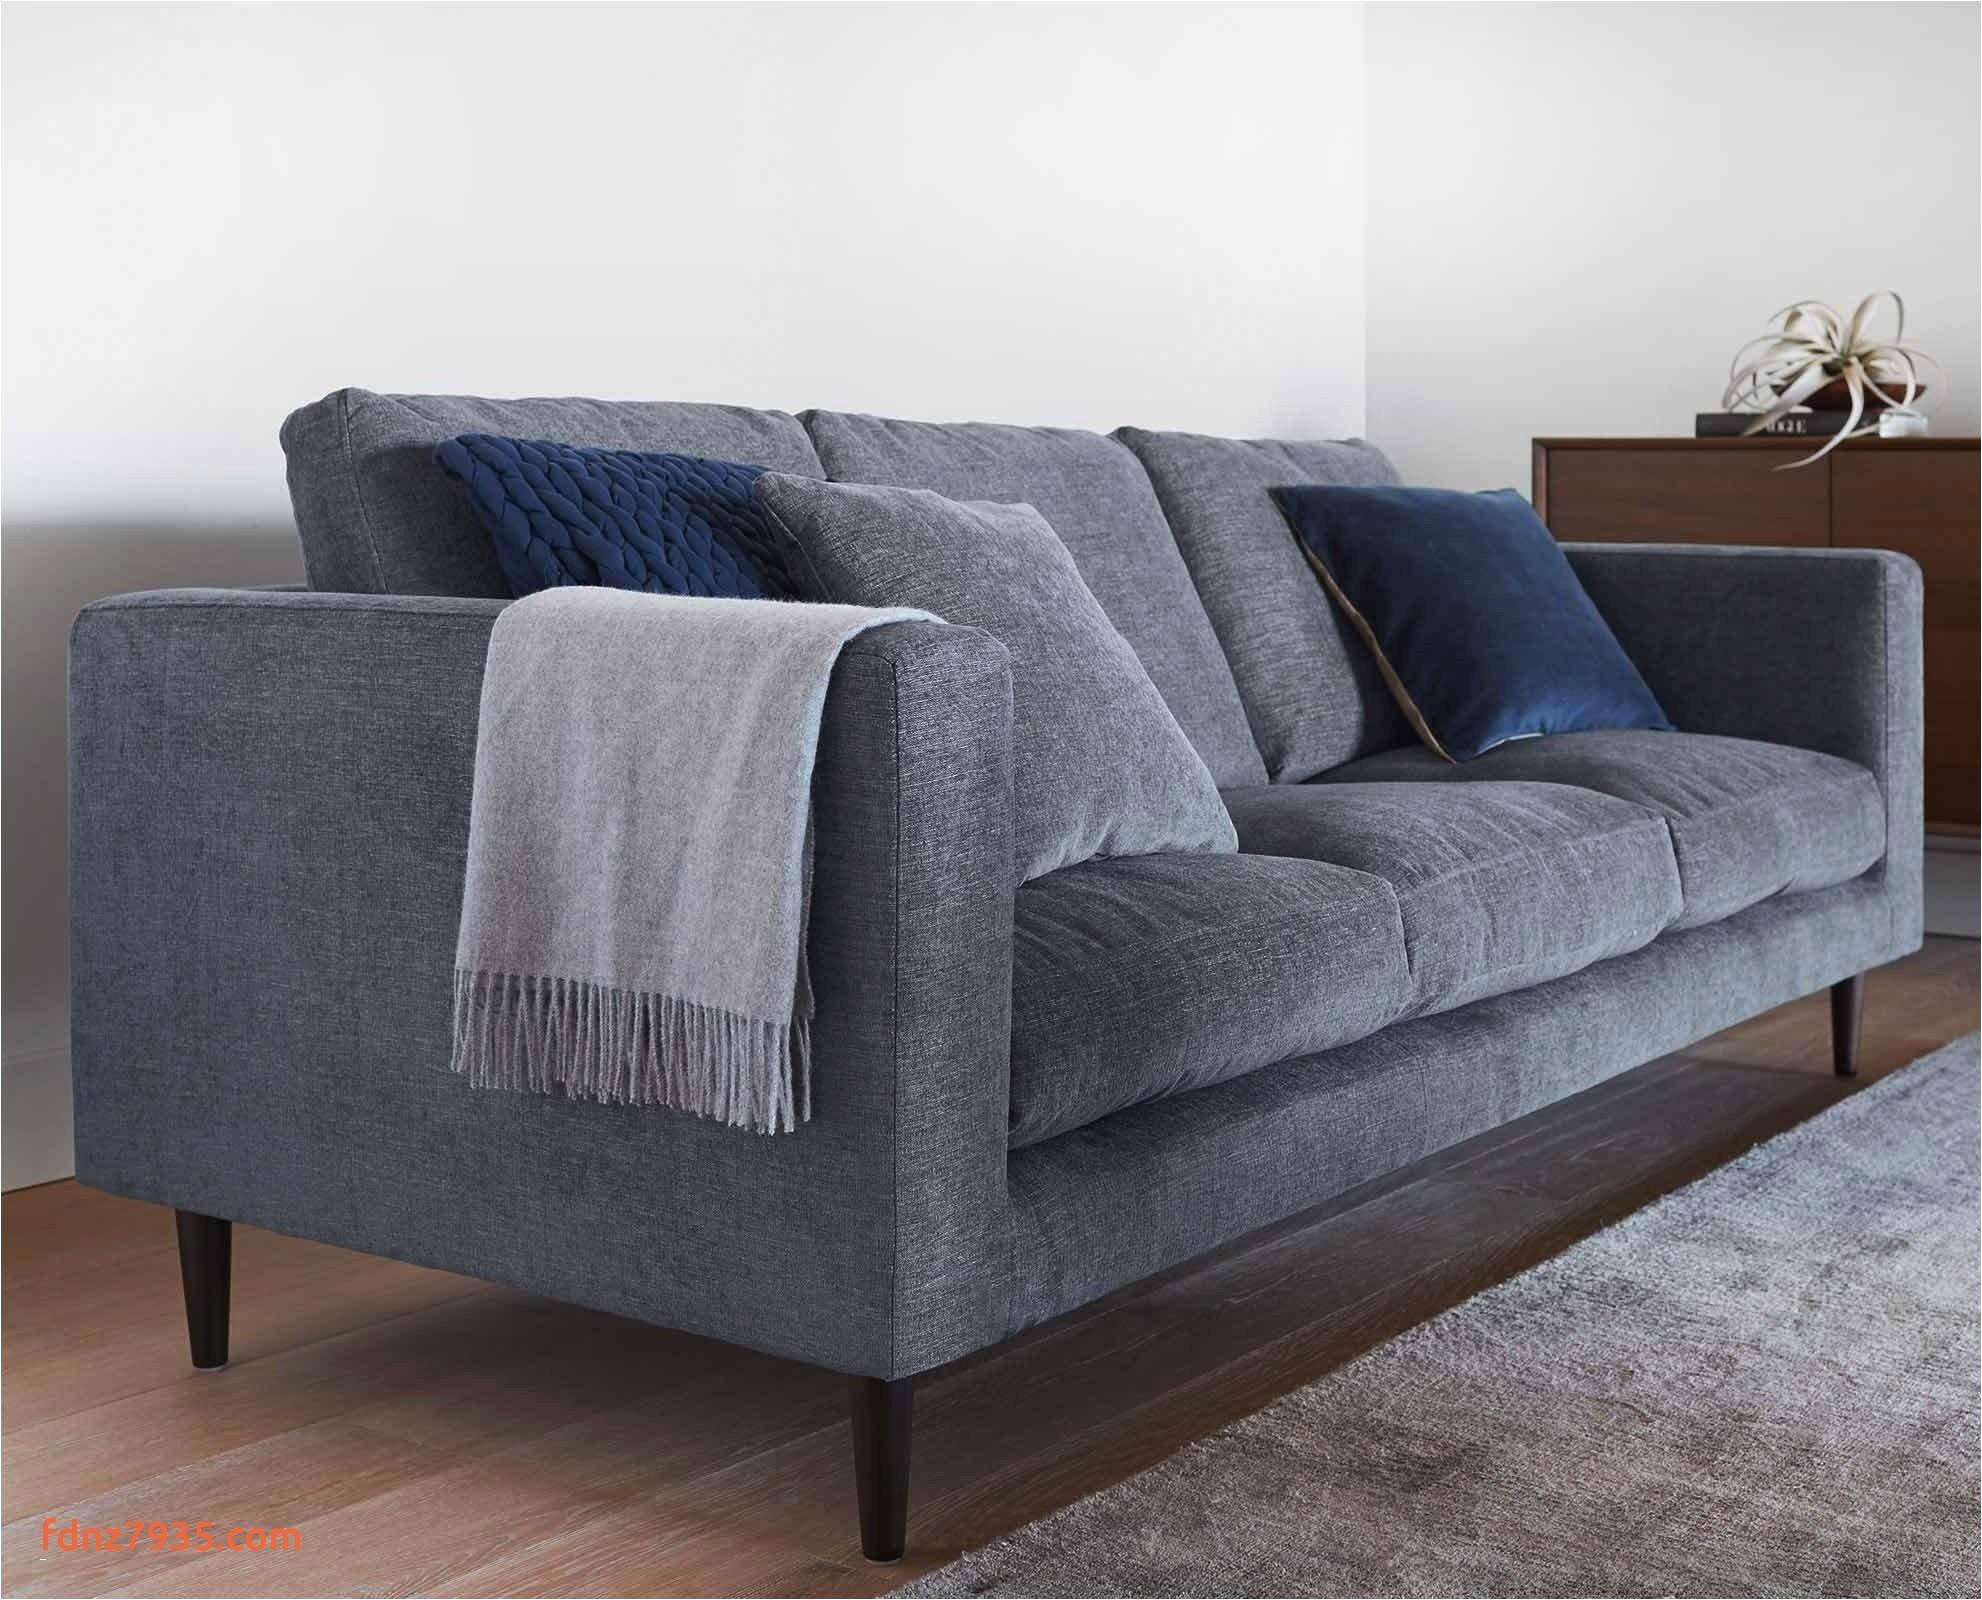 full size of futon exquisit wayfair futon couch furniture furniture www wayfair furniture 0d sleeper